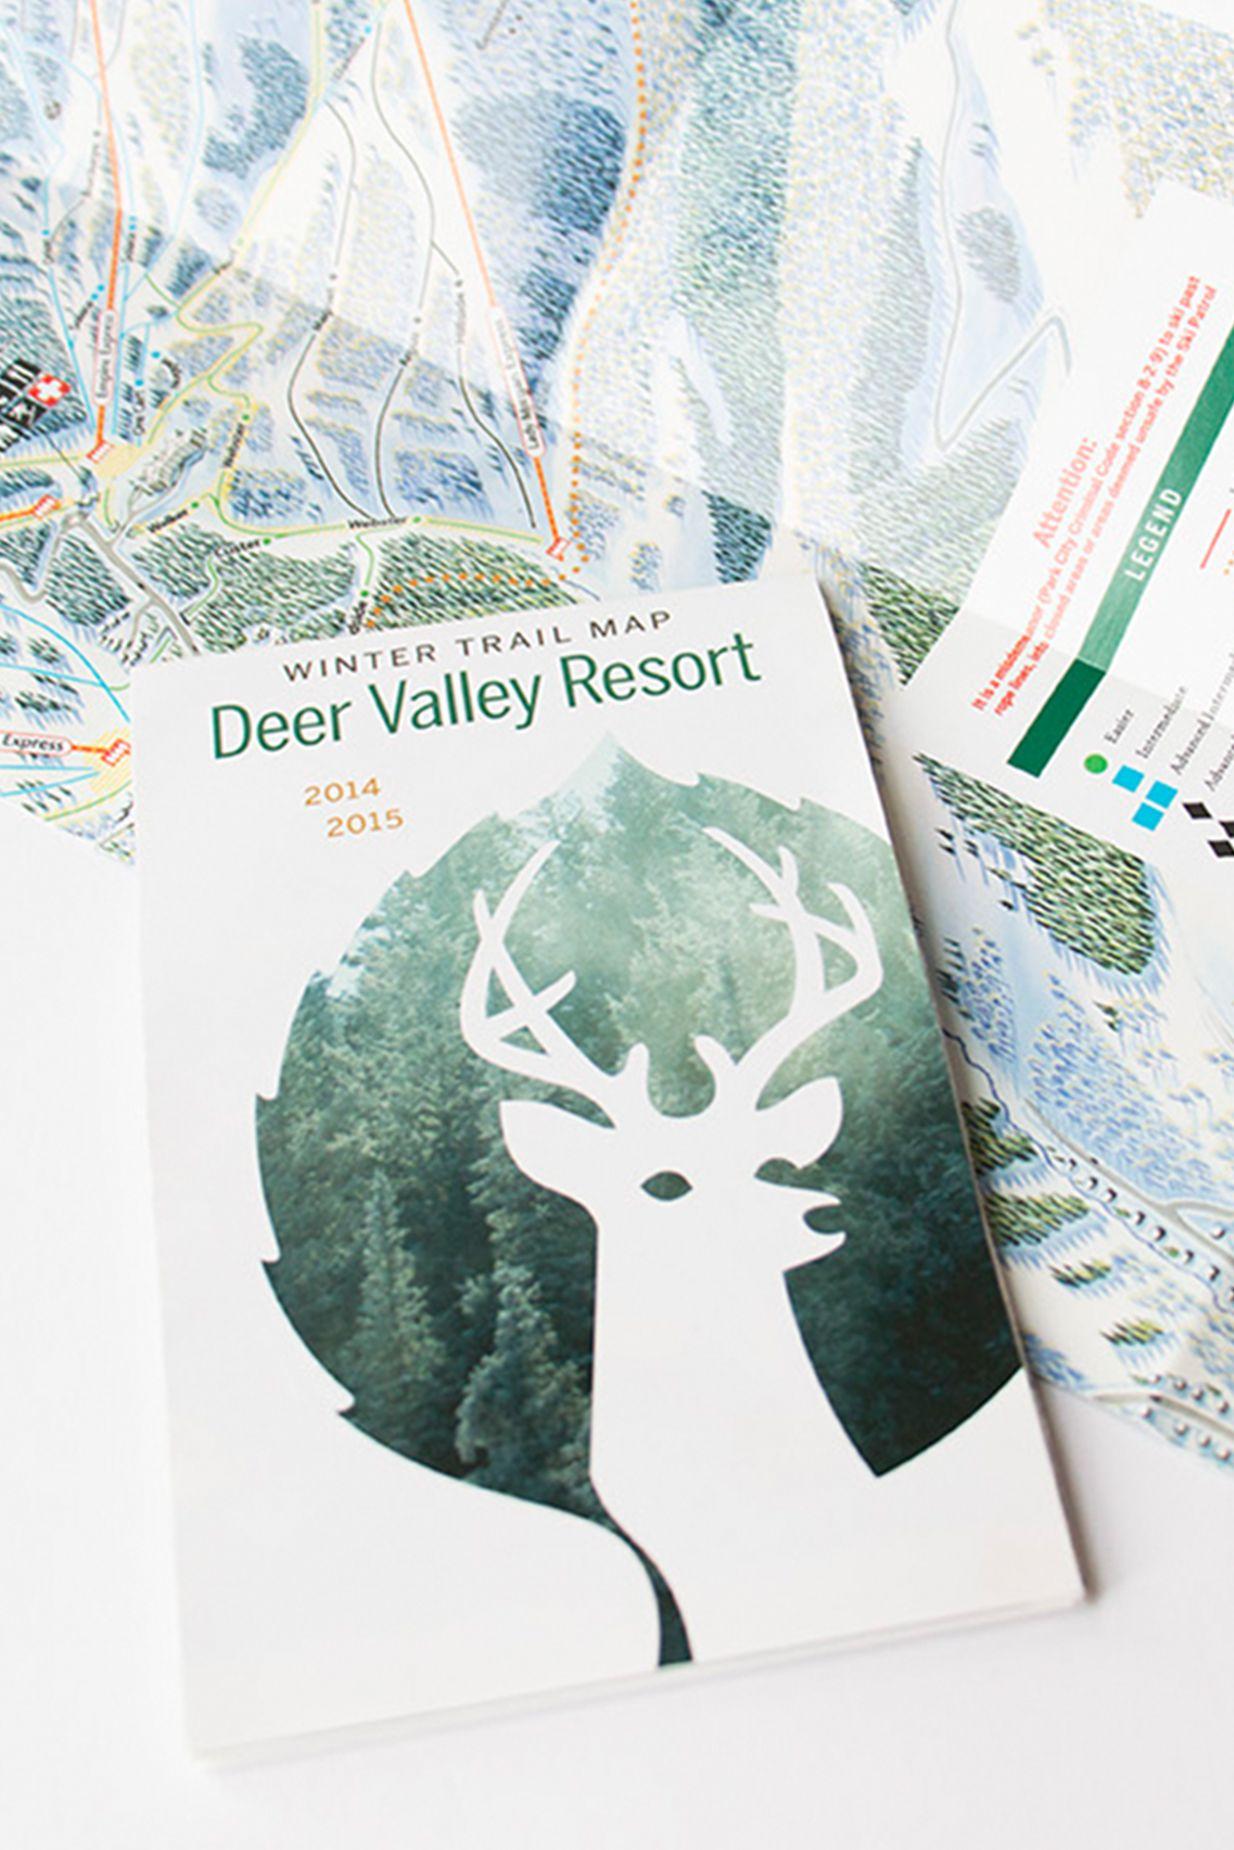 2014/15 Winter Trail Map for Deer Valley Resort